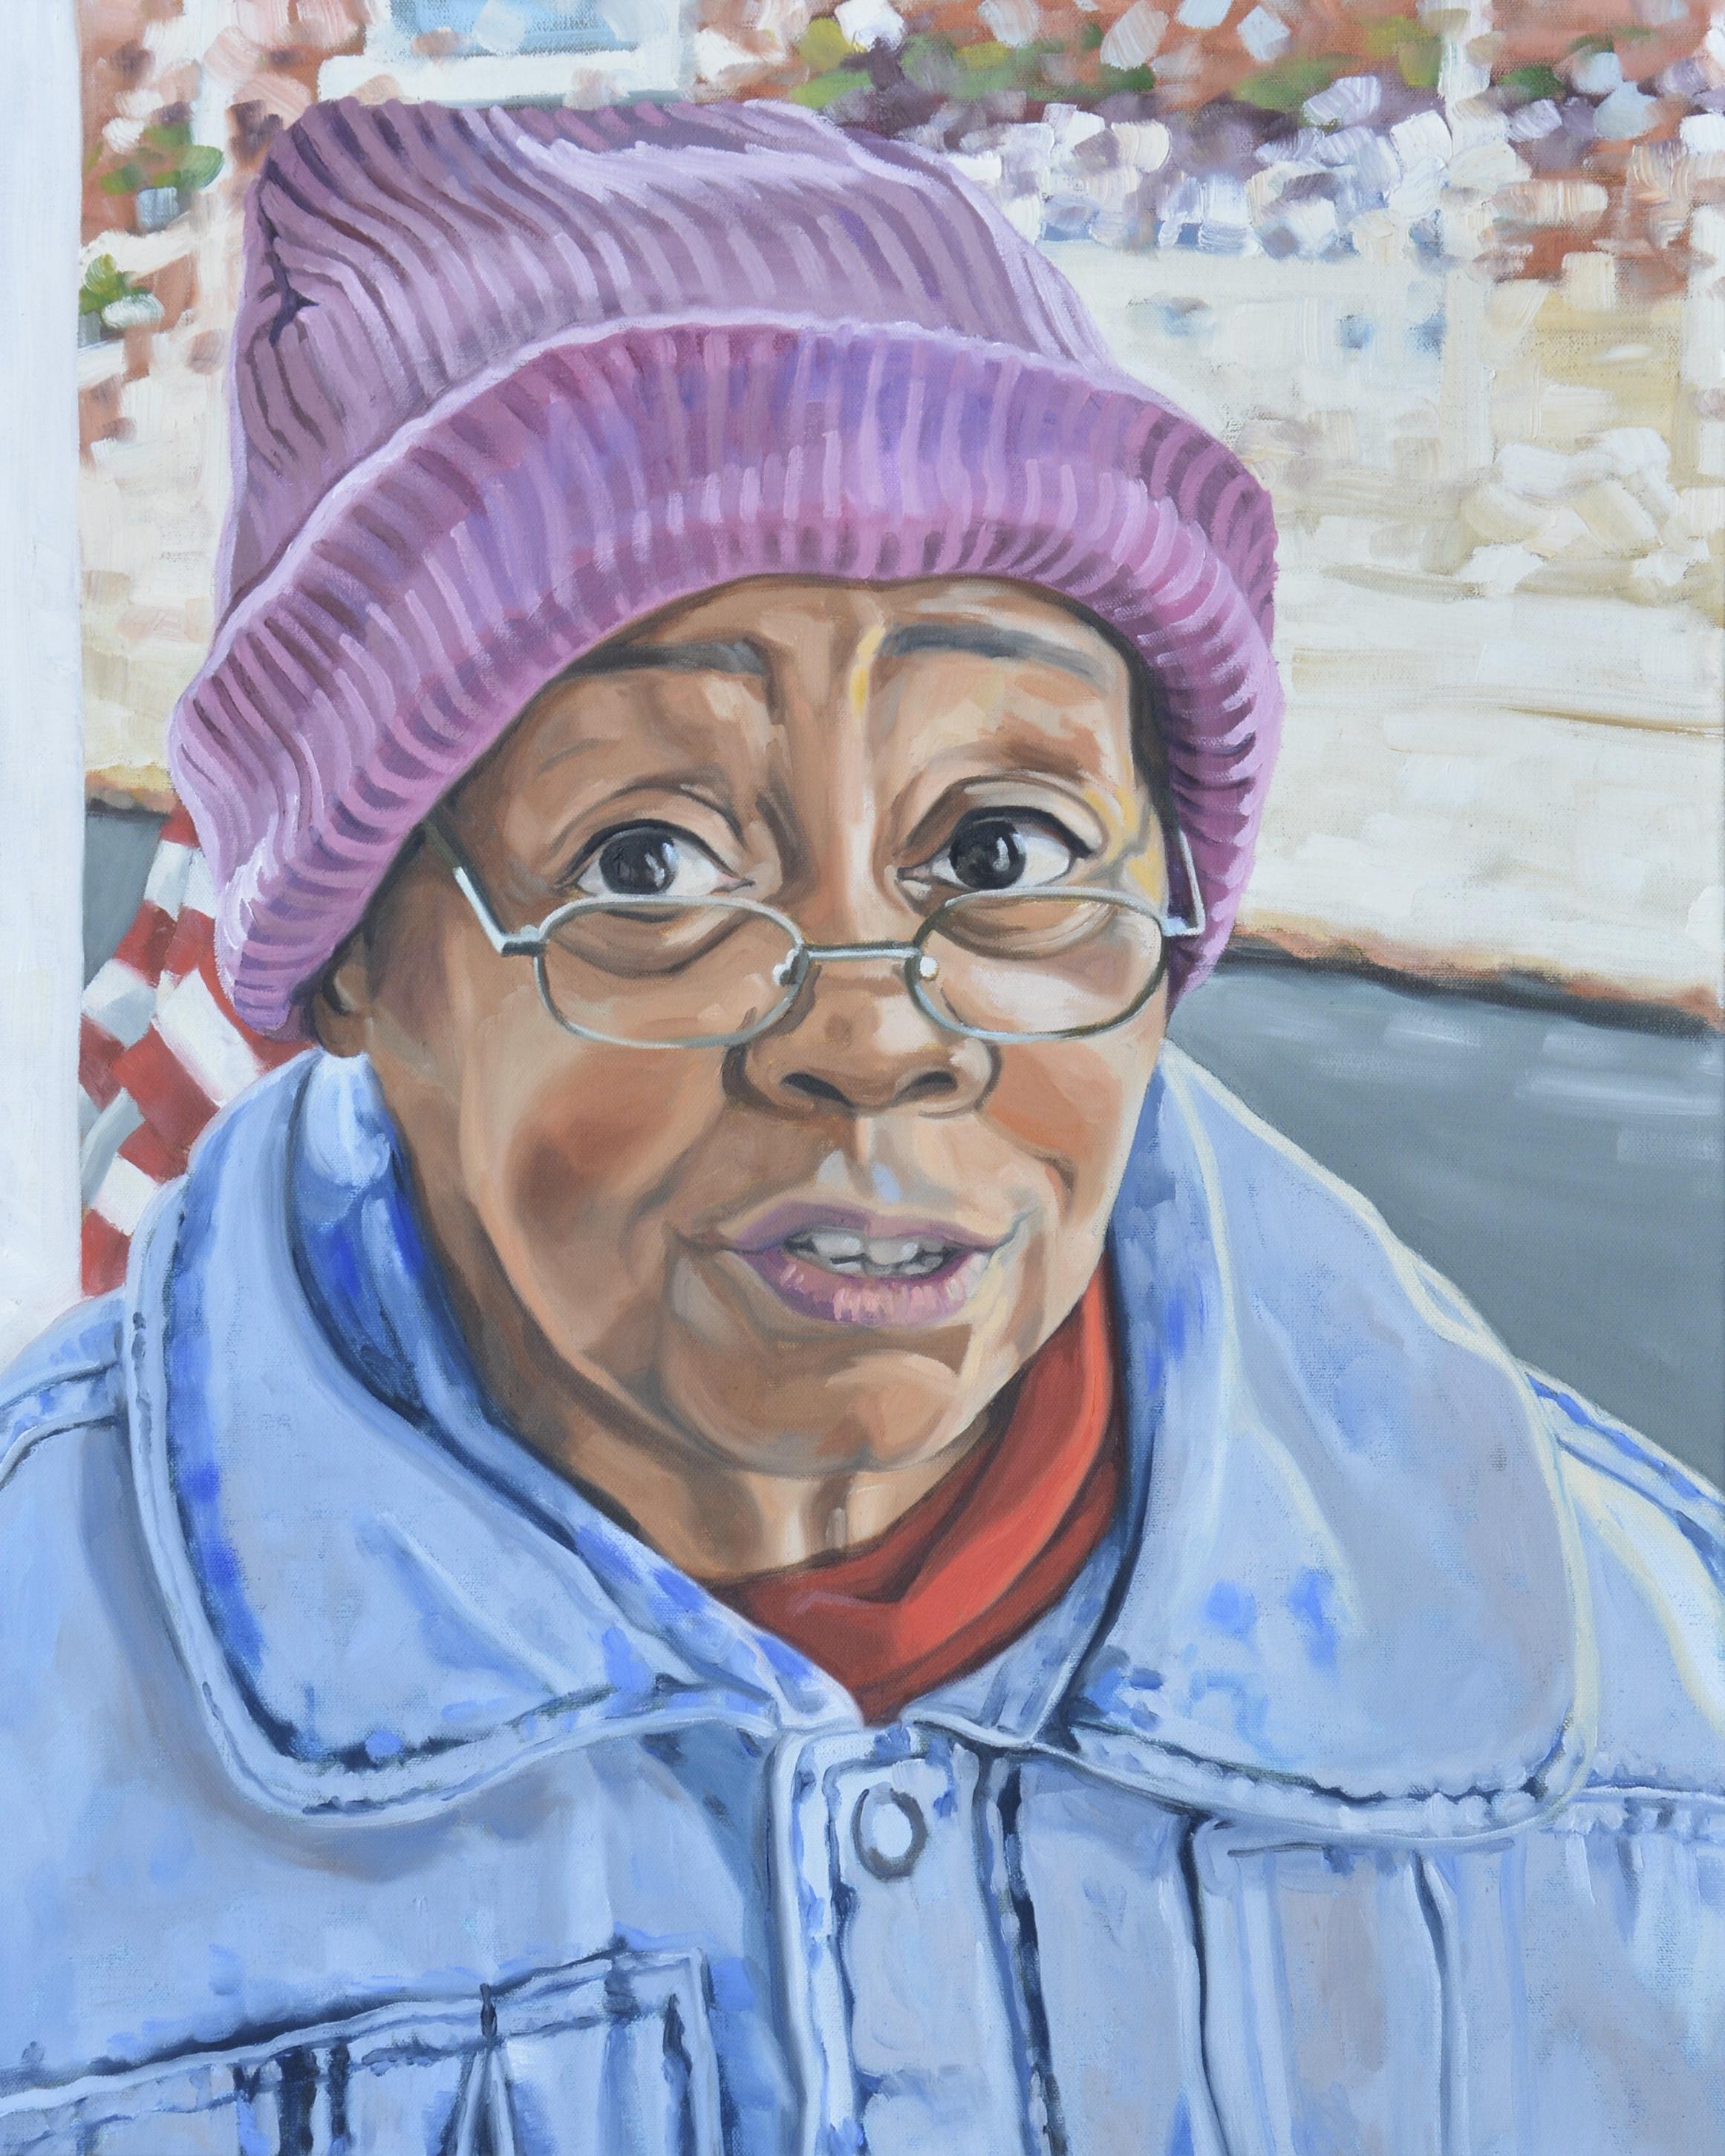 "Copy of Good Neighbors (Diane), 24x30"", oil on canvas, 2017"